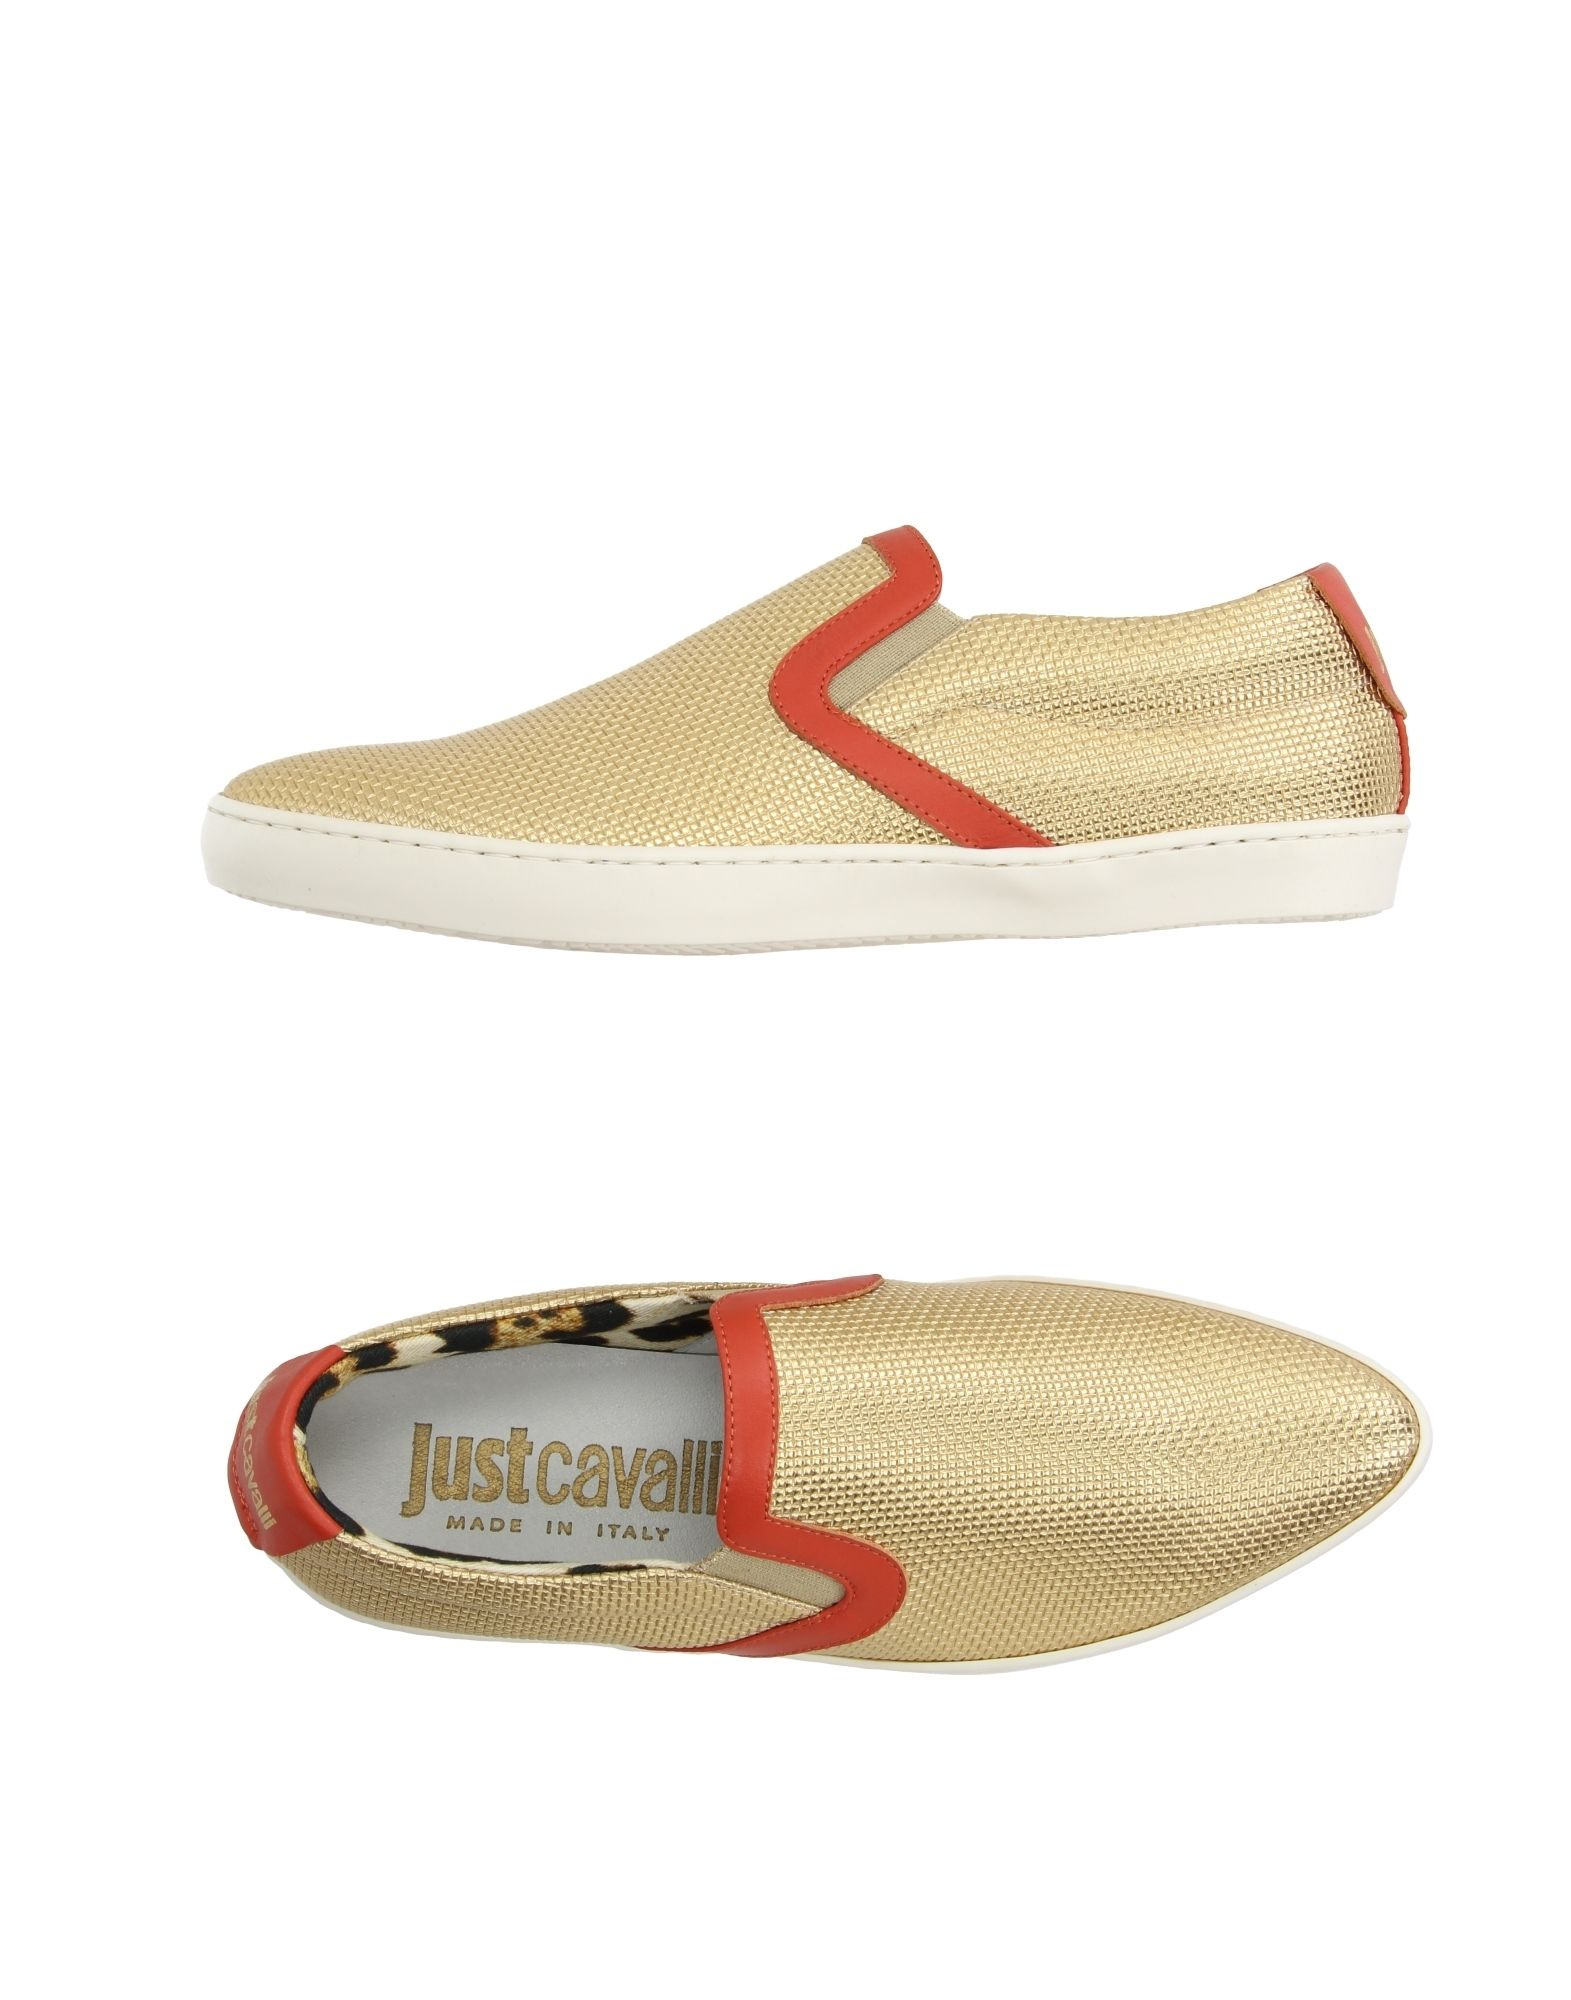 Moda barata y hermosa Zapatillas Zapatillas Just Cavalli Mujer - Zapatillas Zapatillas Just Cavalli  Oro 76e15b